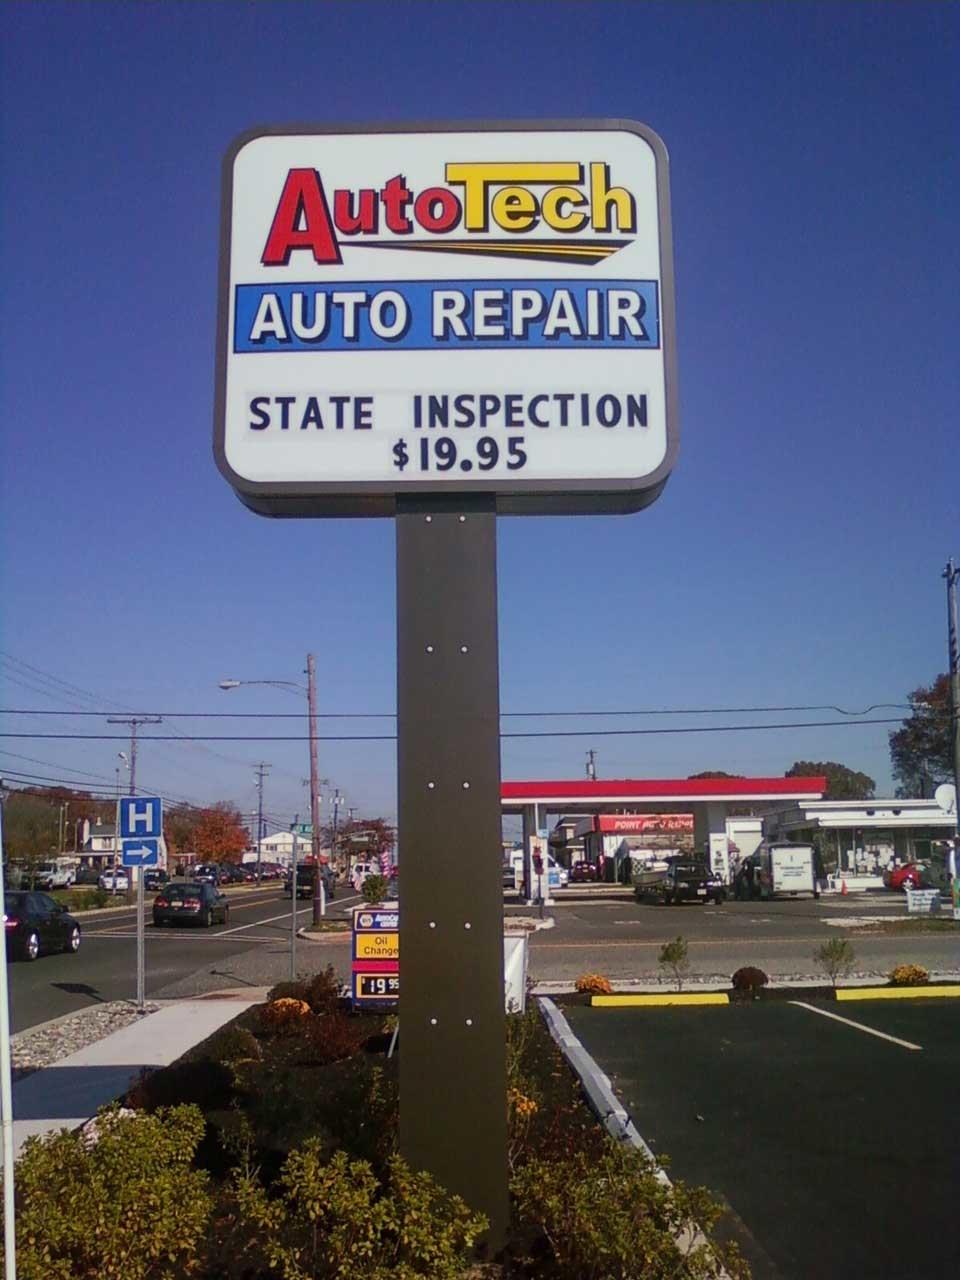 Auto Tech Tire & Service Center image 0